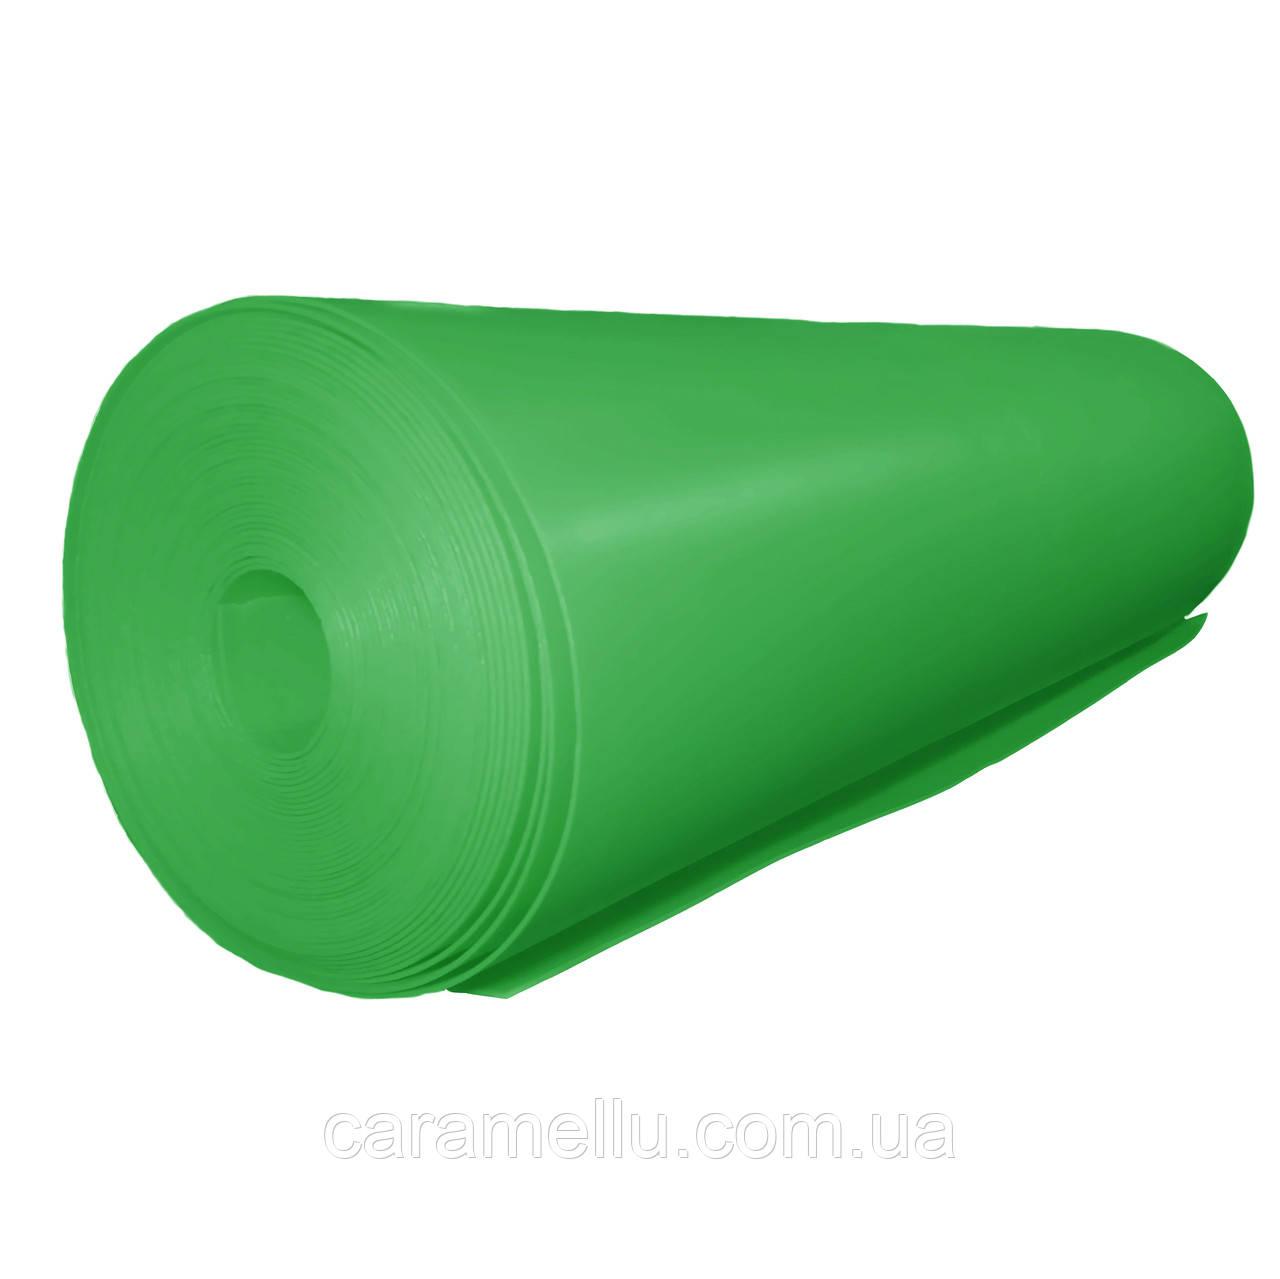 Изолон 2мм. Ярко-зеленый